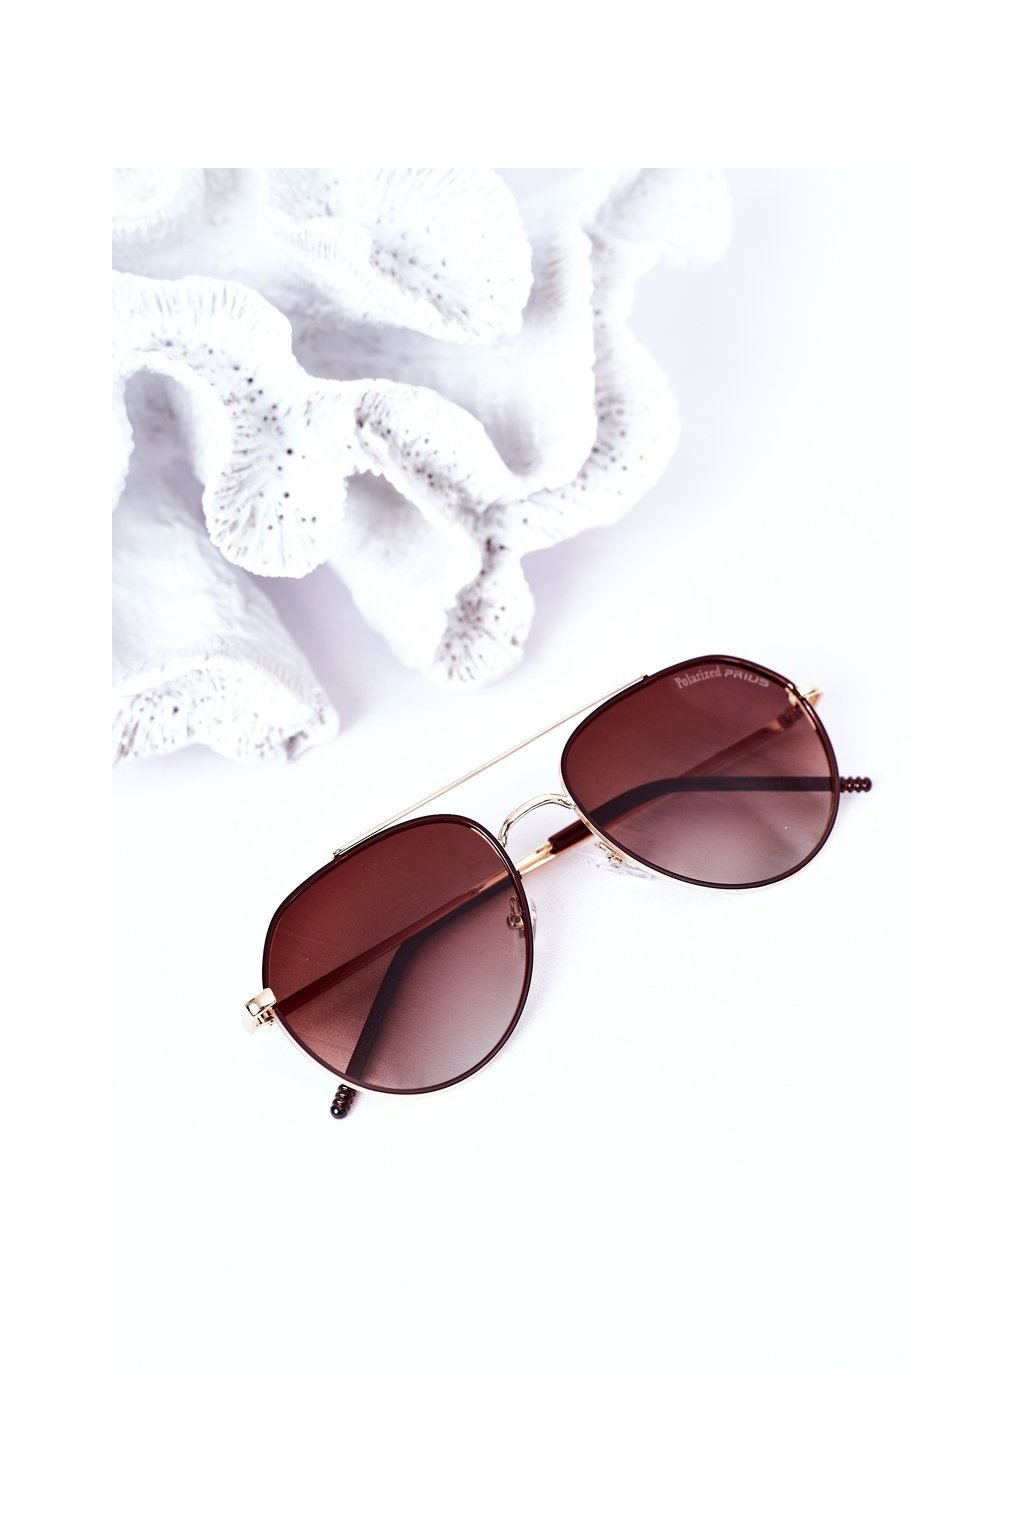 Módne slnečné okuliare hendé Polarized PRIUS PRIUS003 BROWN